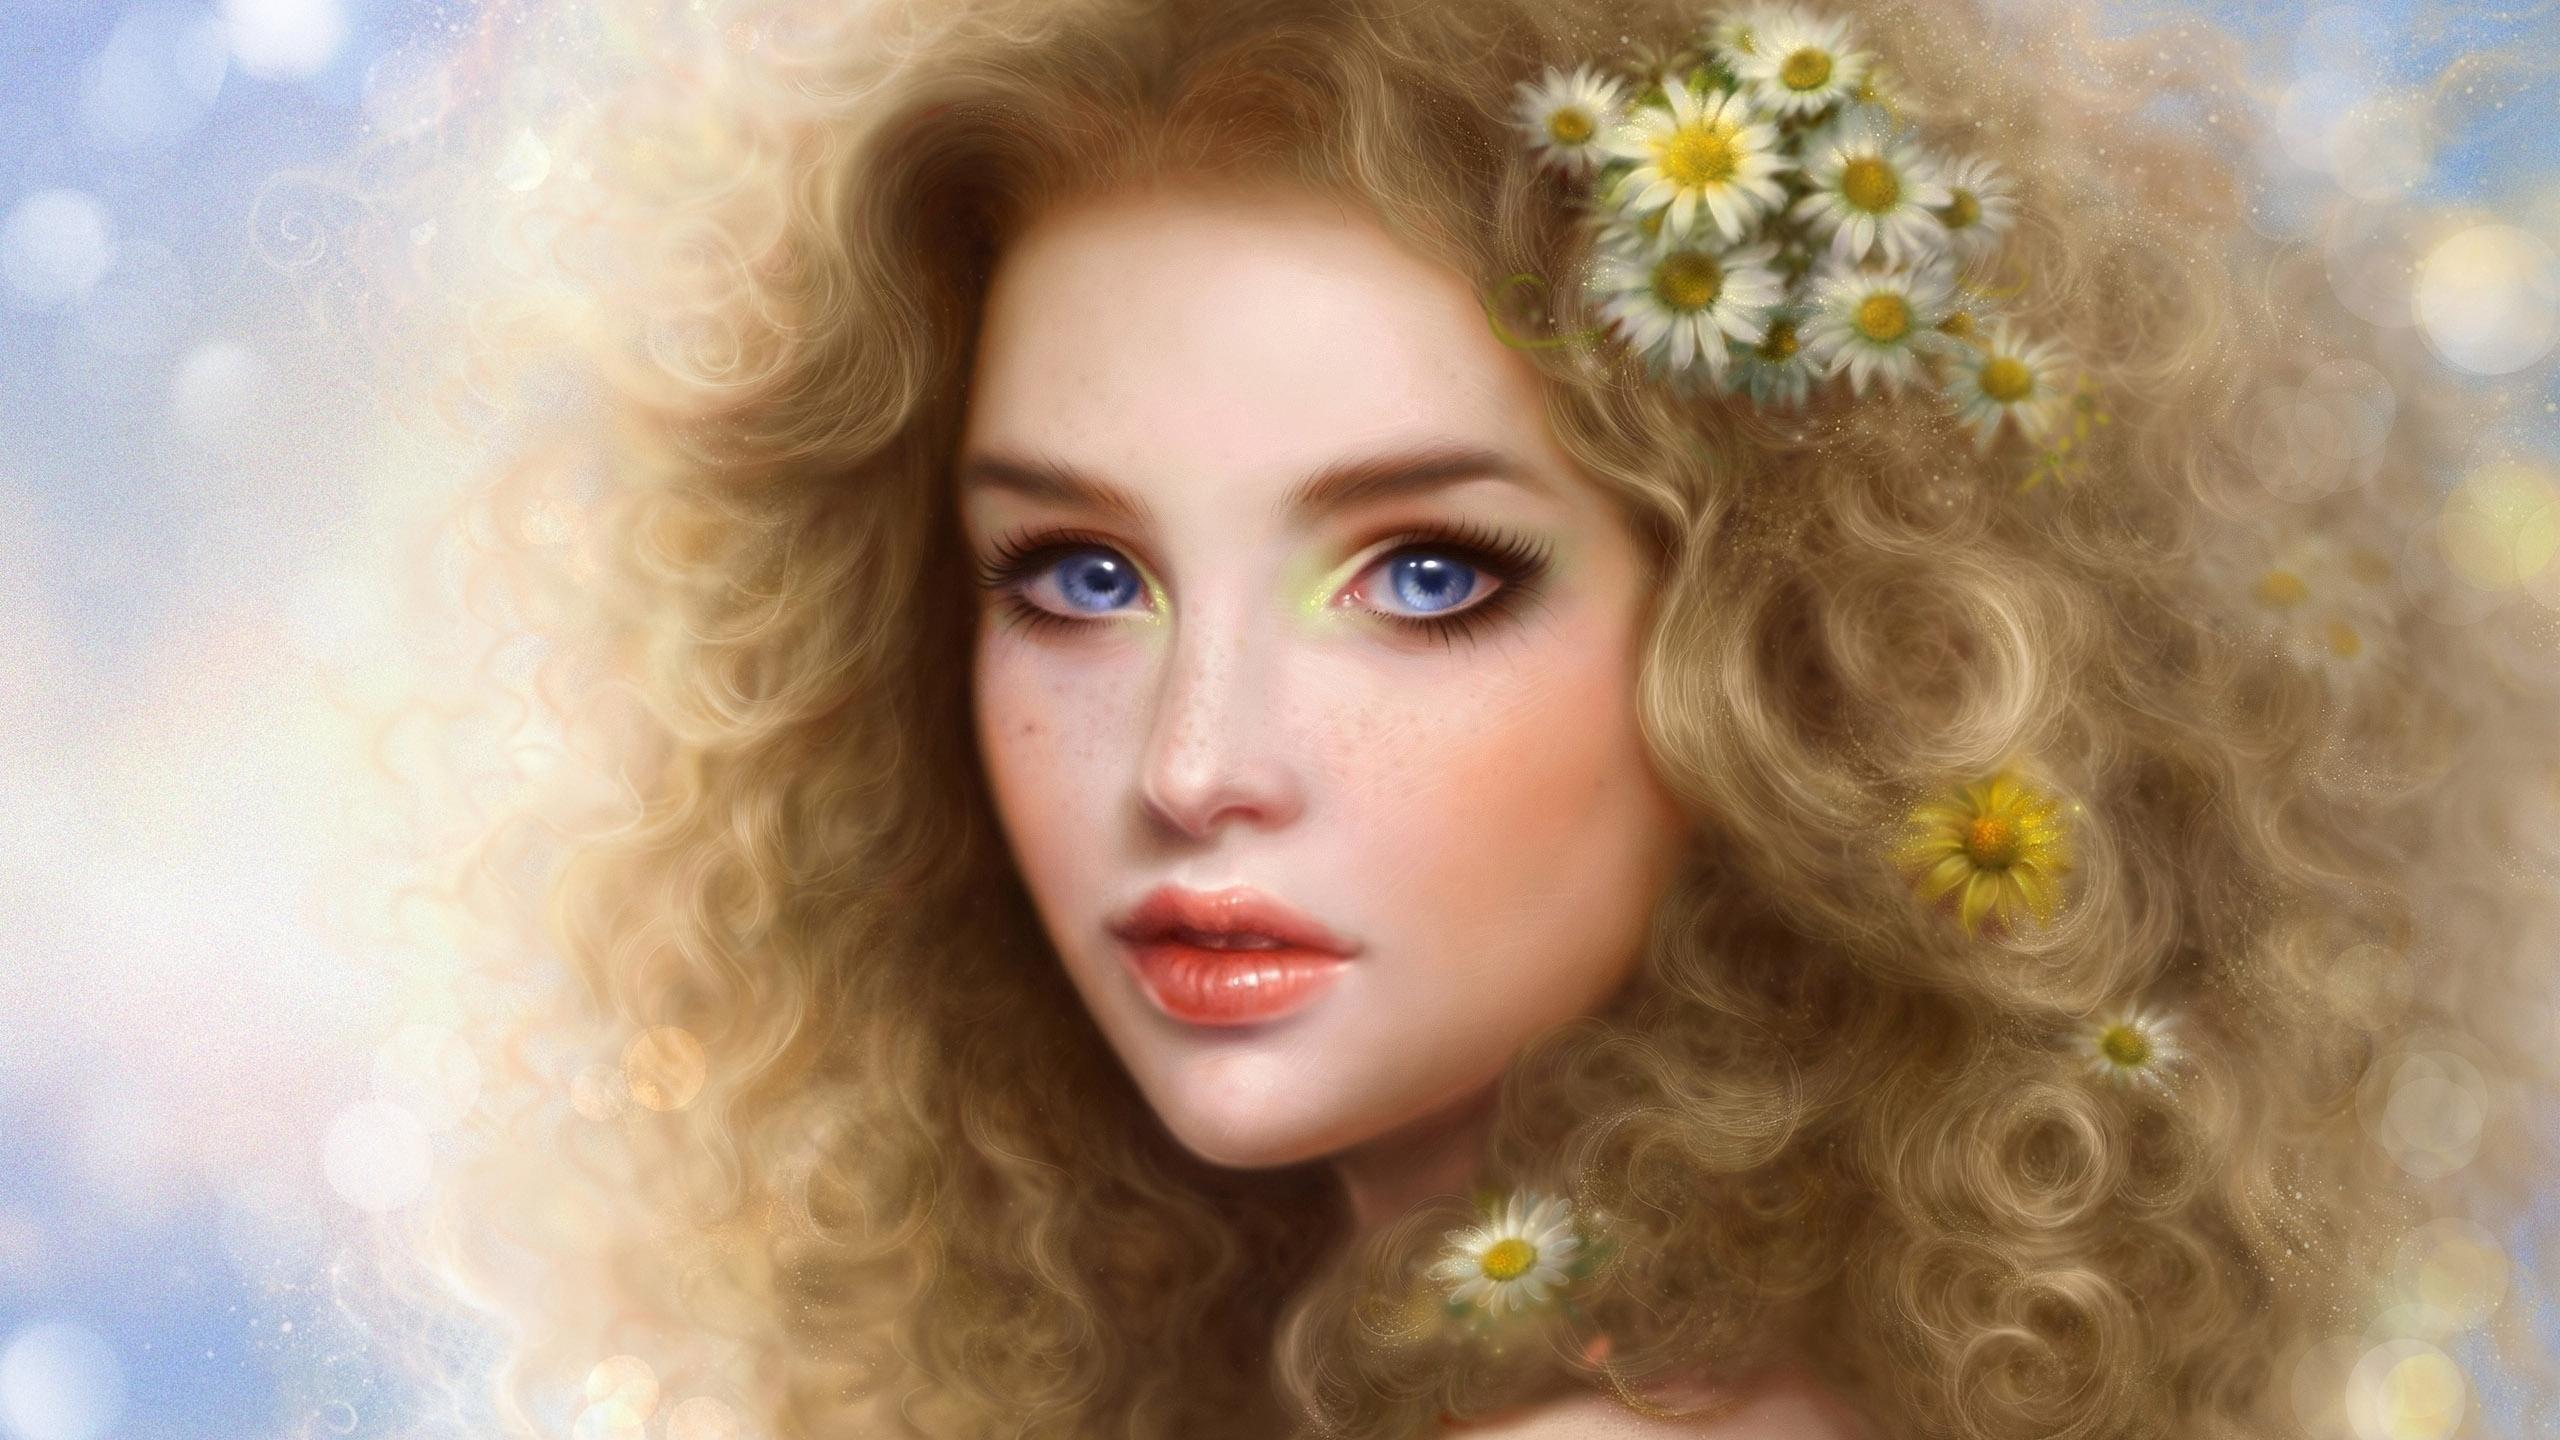 Fantasy girl blue eyes beautiful face blonde girl daisy hair flower  wallpaper | | 594493 | WallpaperUP